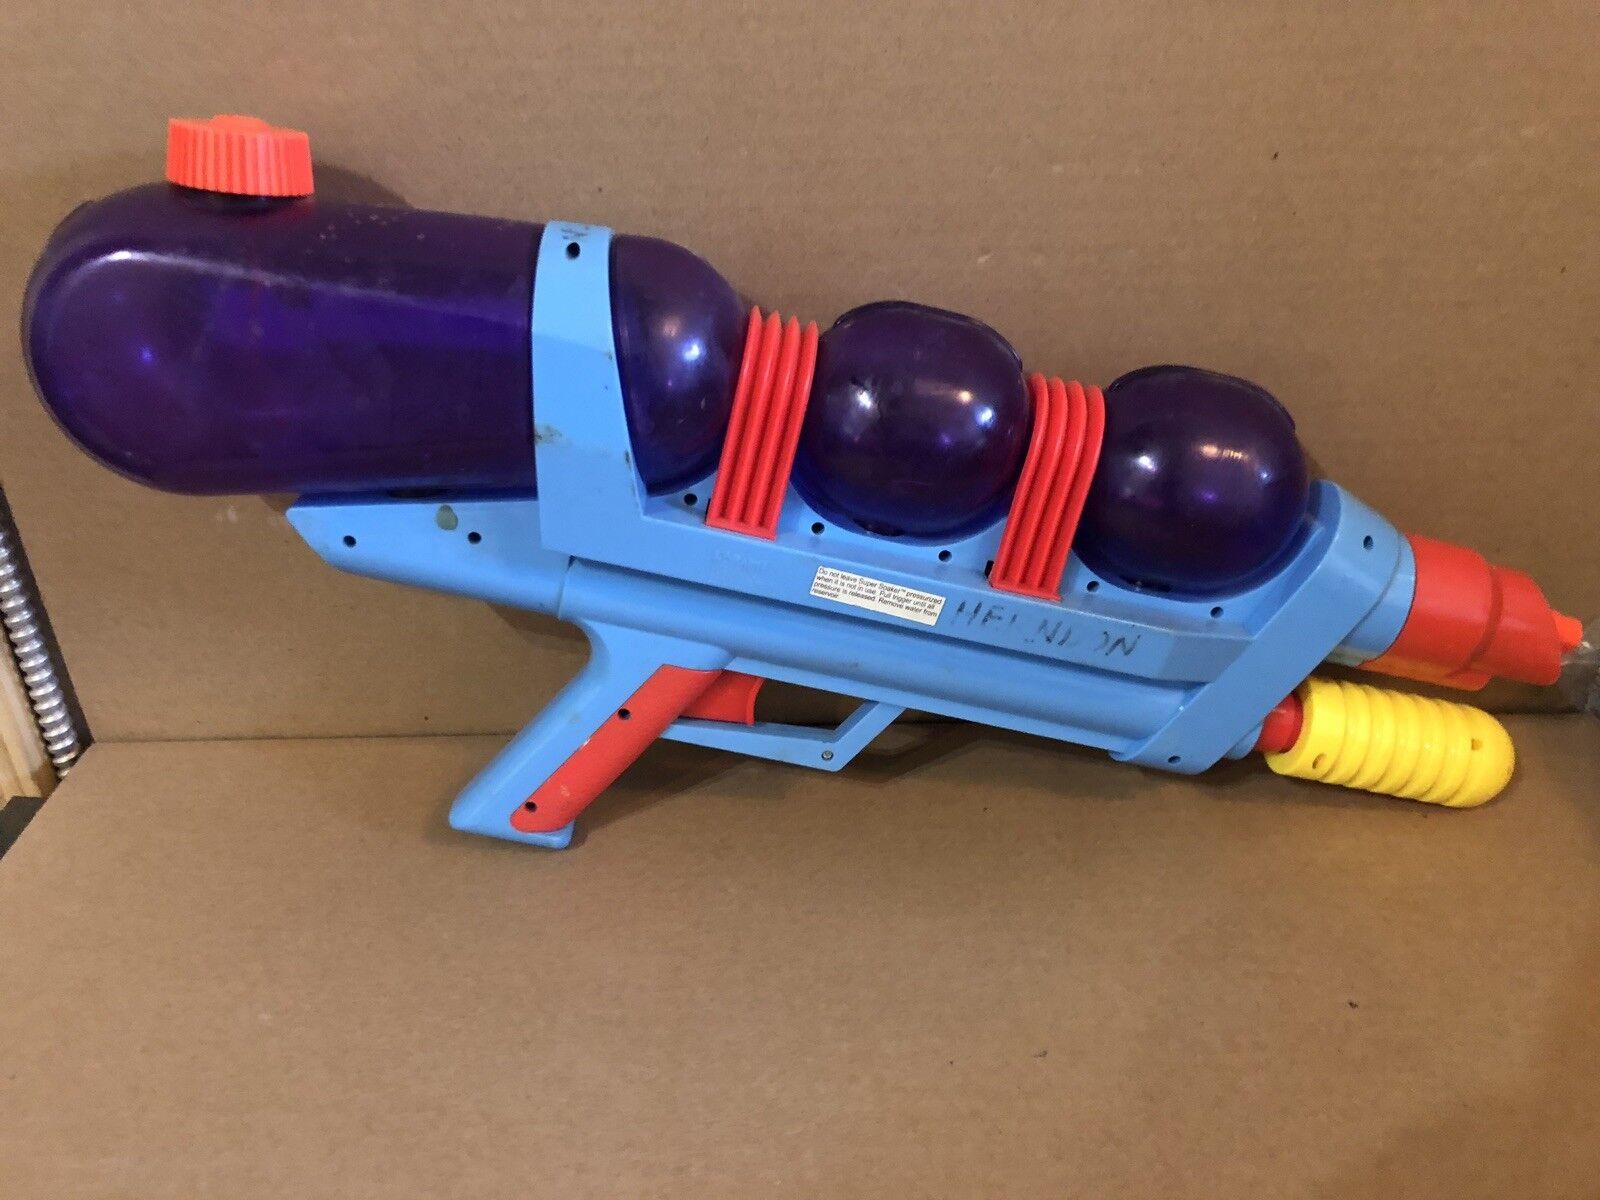 Vintage 90s Larami Larami Larami Super Soaker XP 110 Xtra Power Water Gun Squirt Toy 9711-0 75c4e6